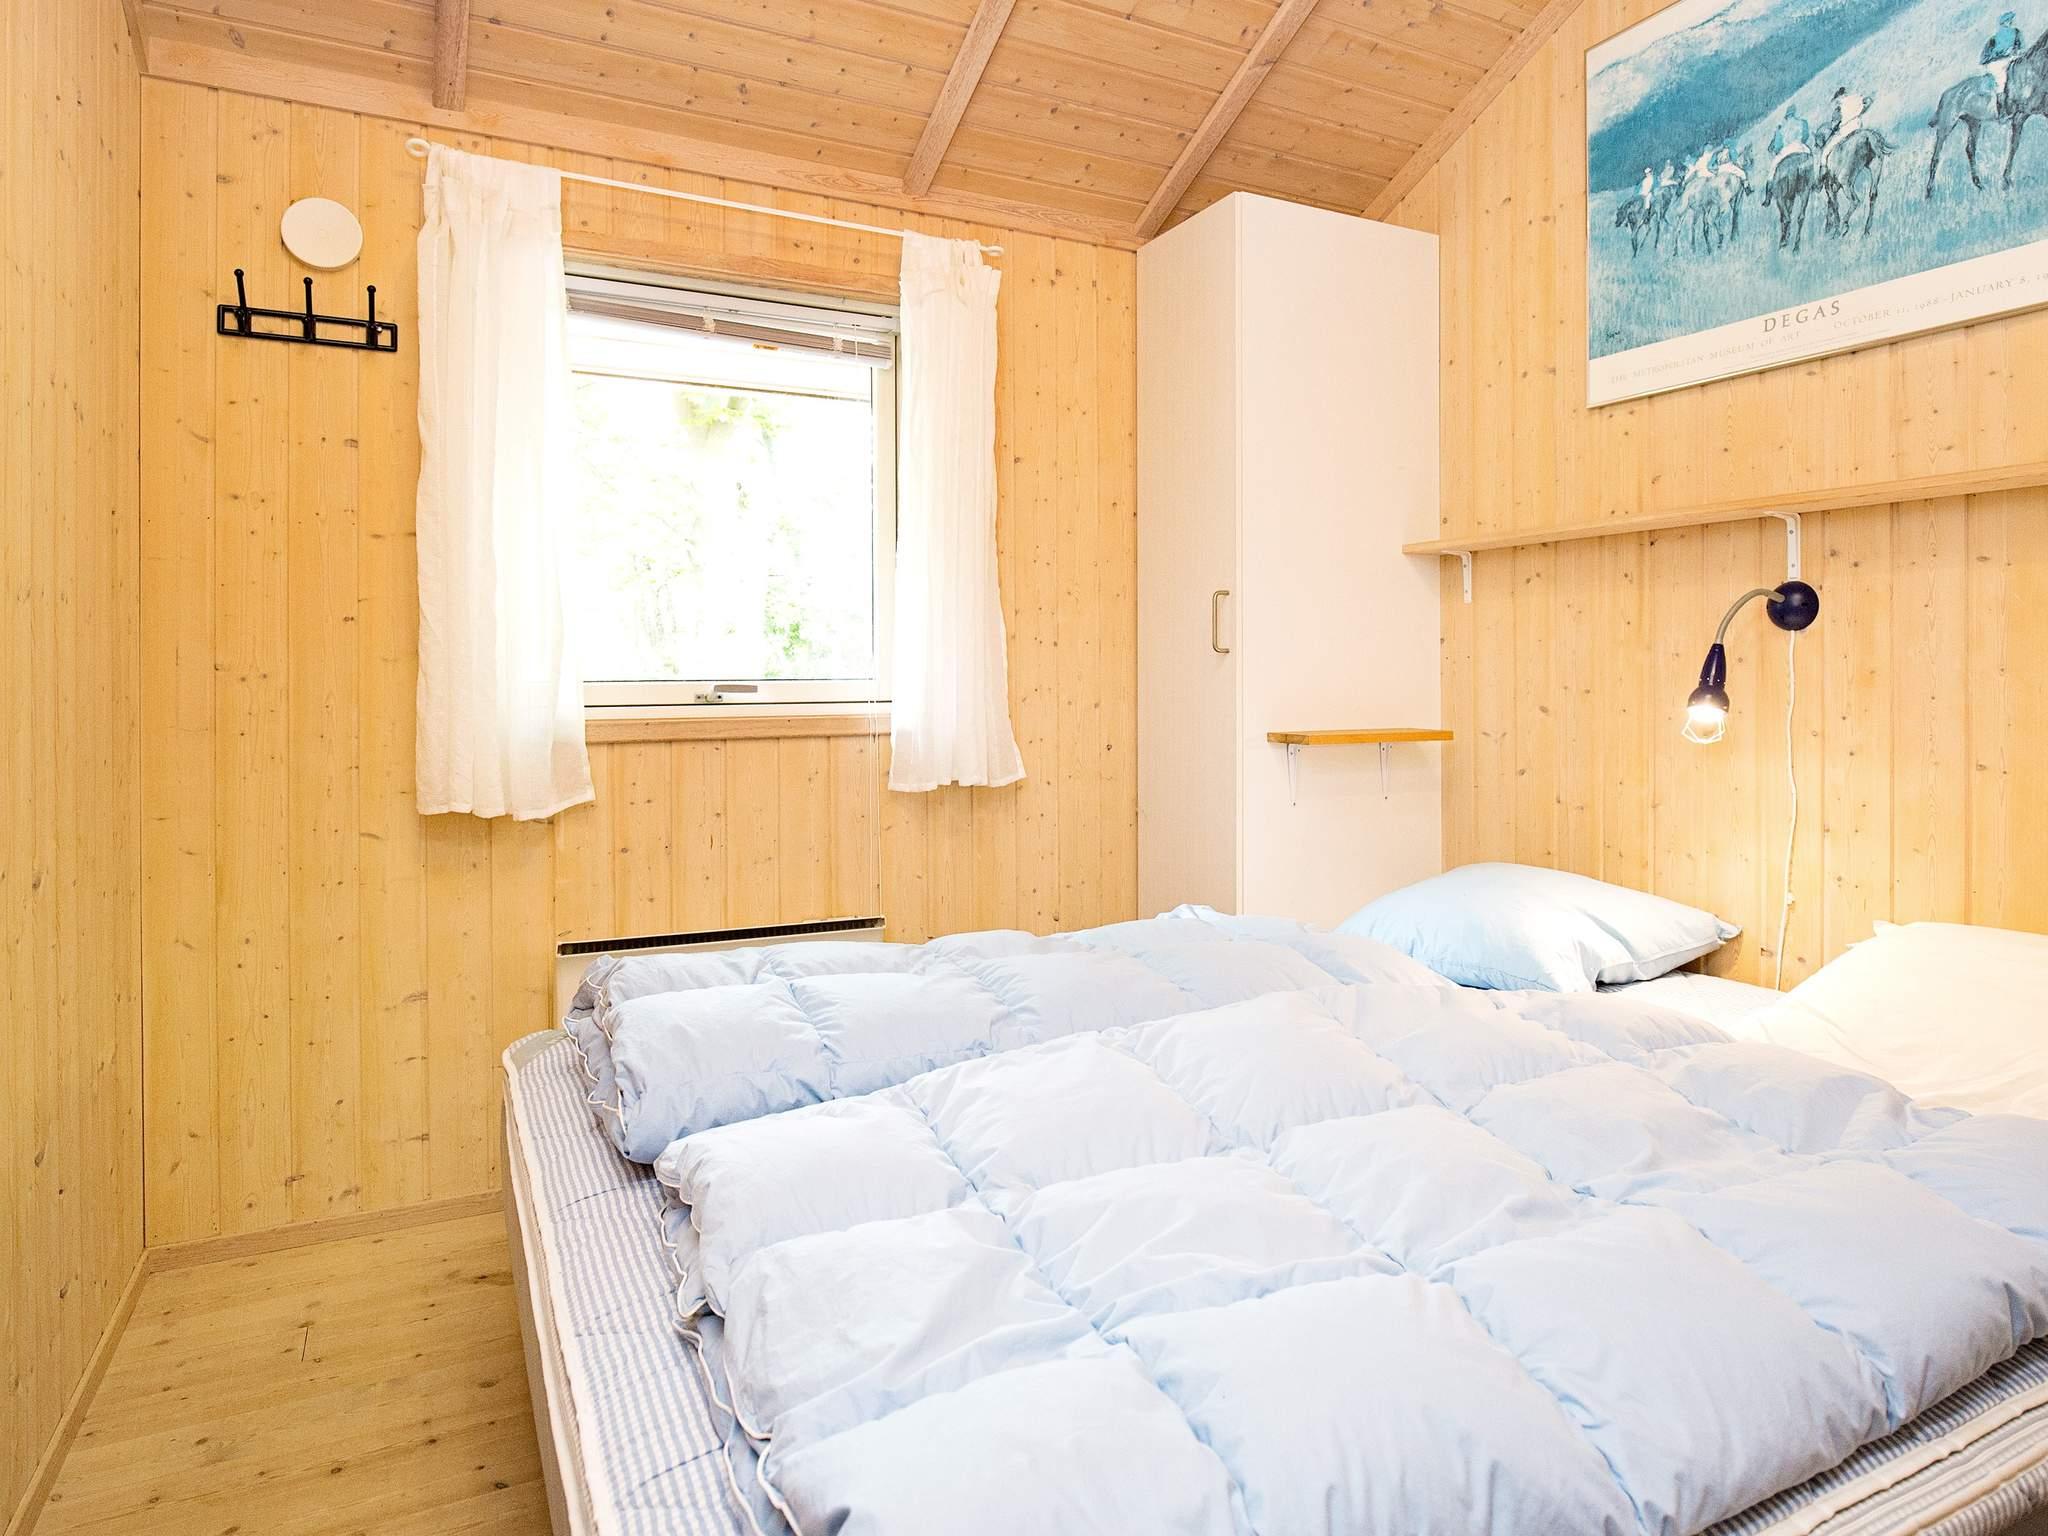 Ferienhaus Hornbæk (87412), Hornbæk, , Nordseeland, Dänemark, Bild 12